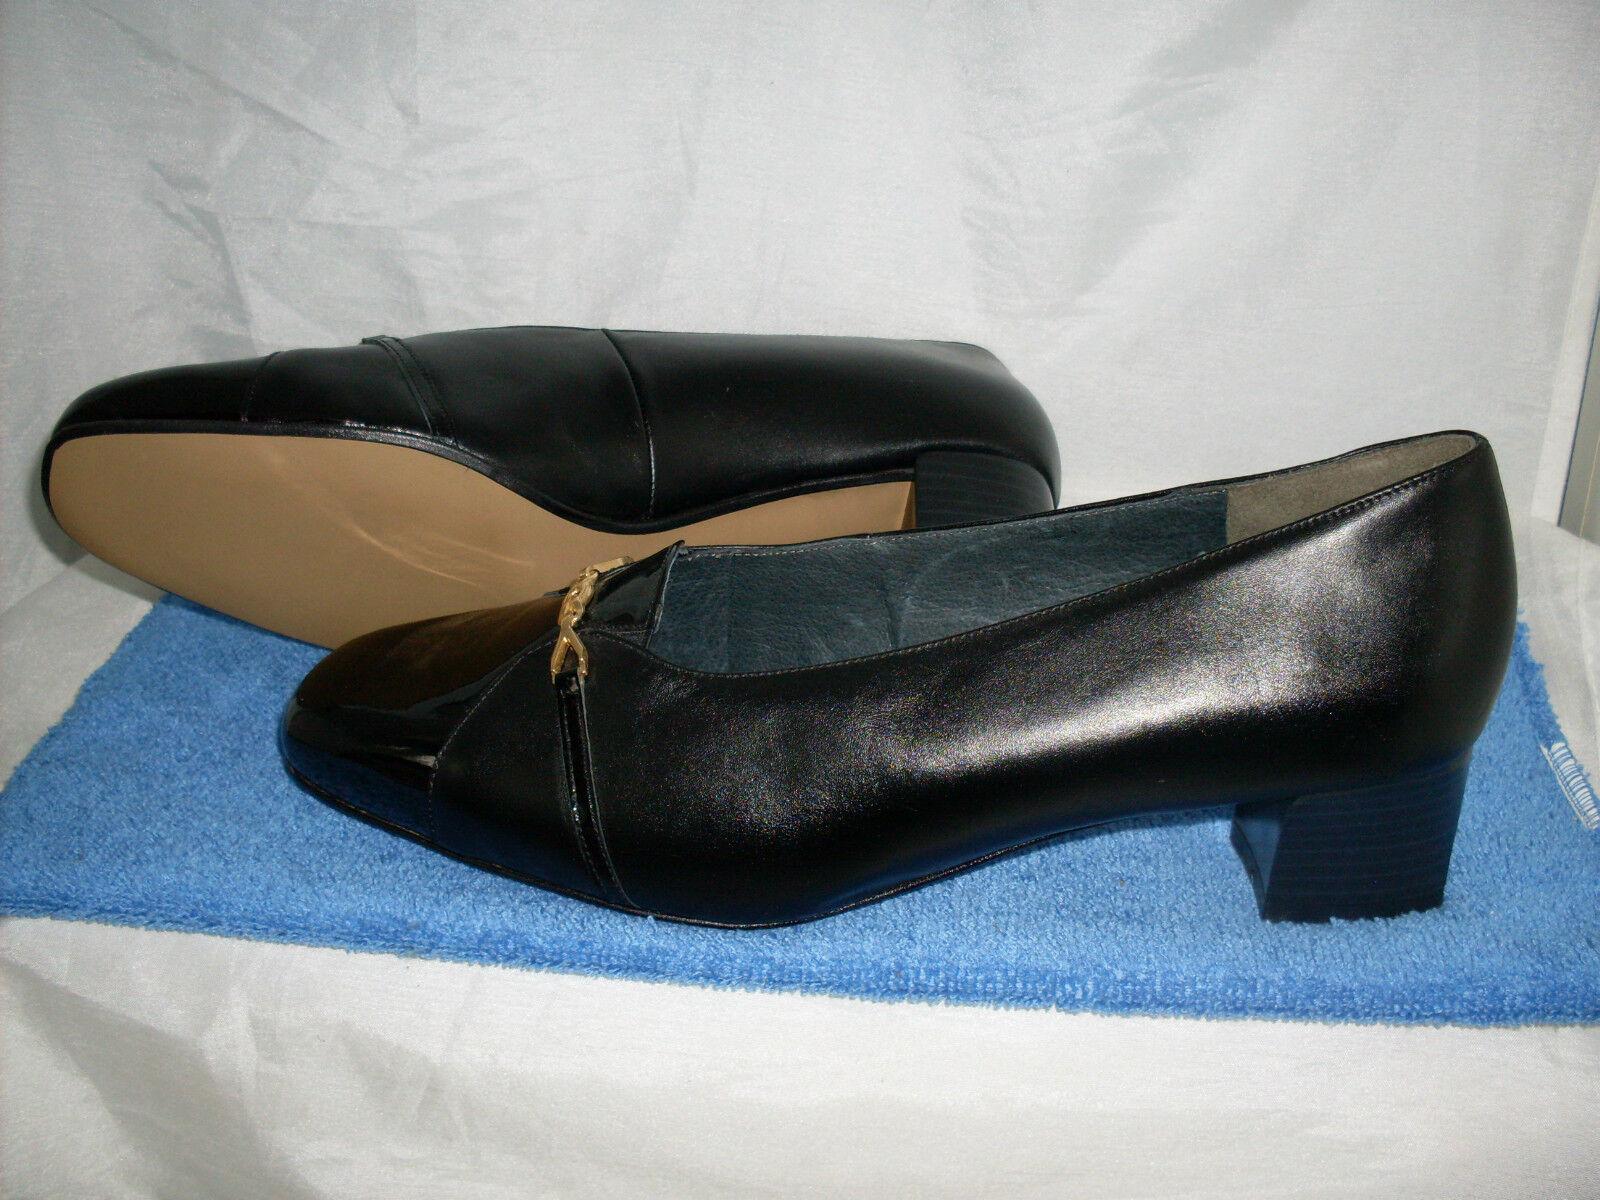 Damenschuh Vasana Pumps NEU Gr. Gr. NEU 8,5 42,5 H in schwarz Lack & Nappaleder ac32bf